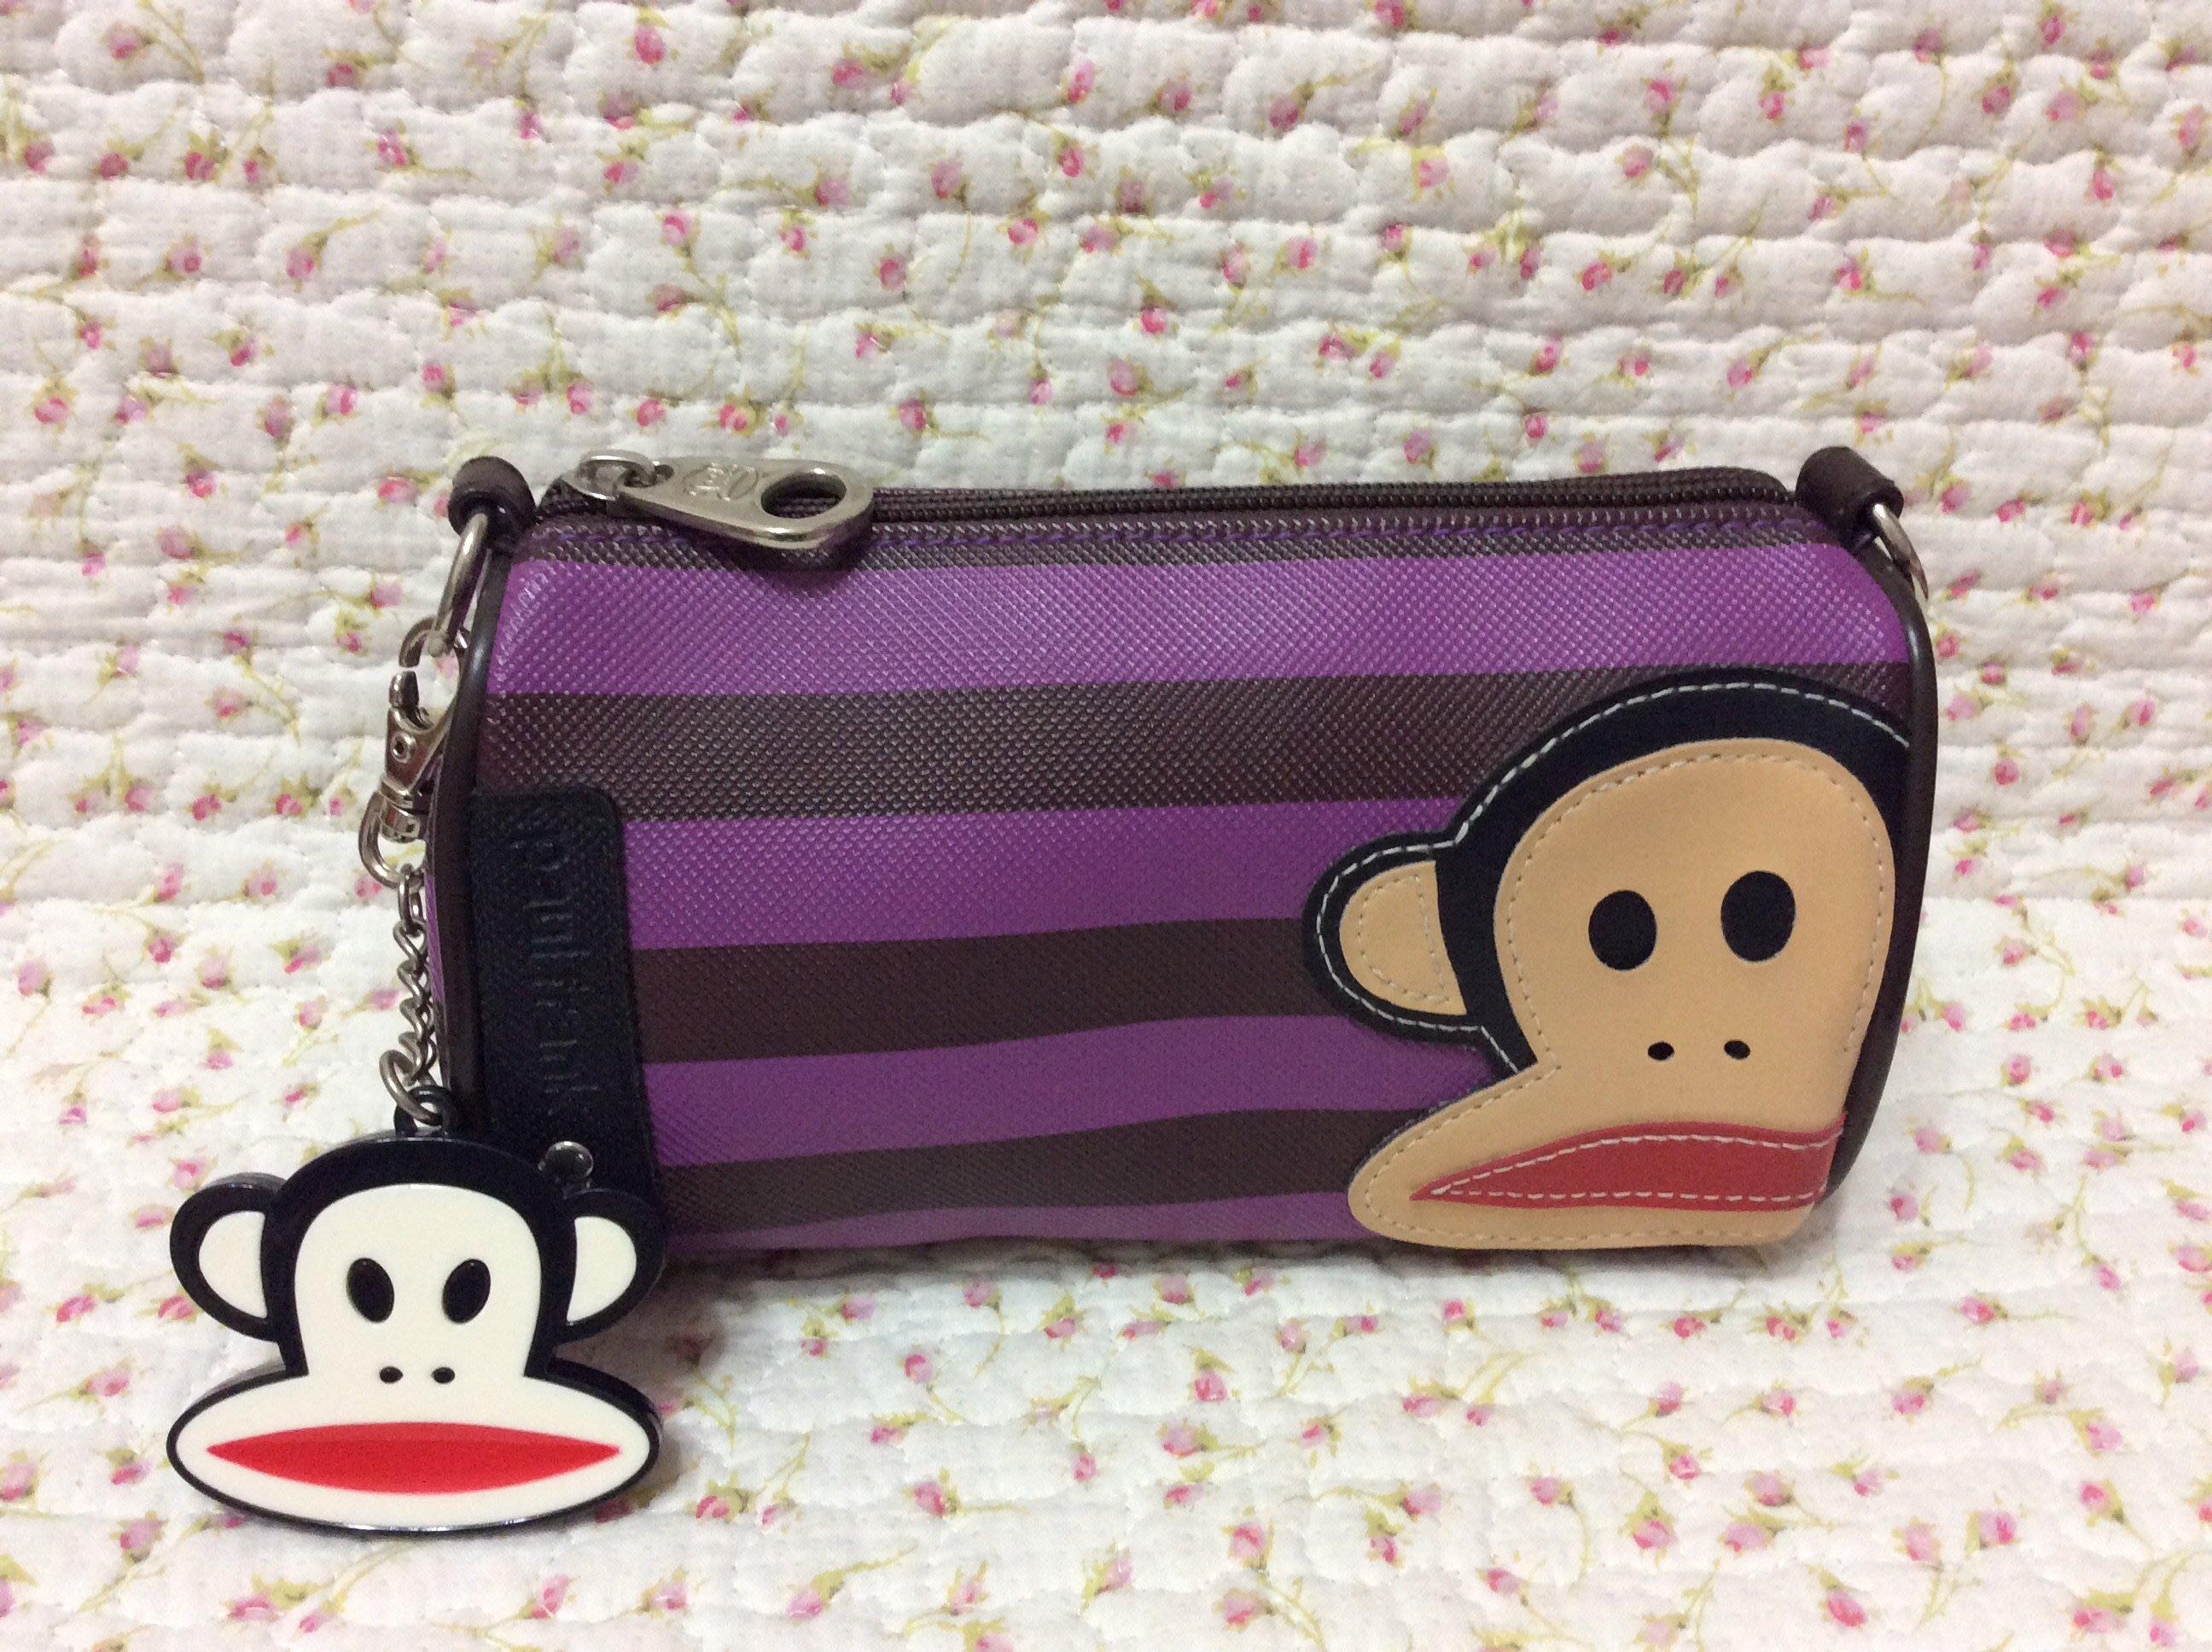 Paul frank 大嘴猴化妝包/收納包《紫色》原價980特價500